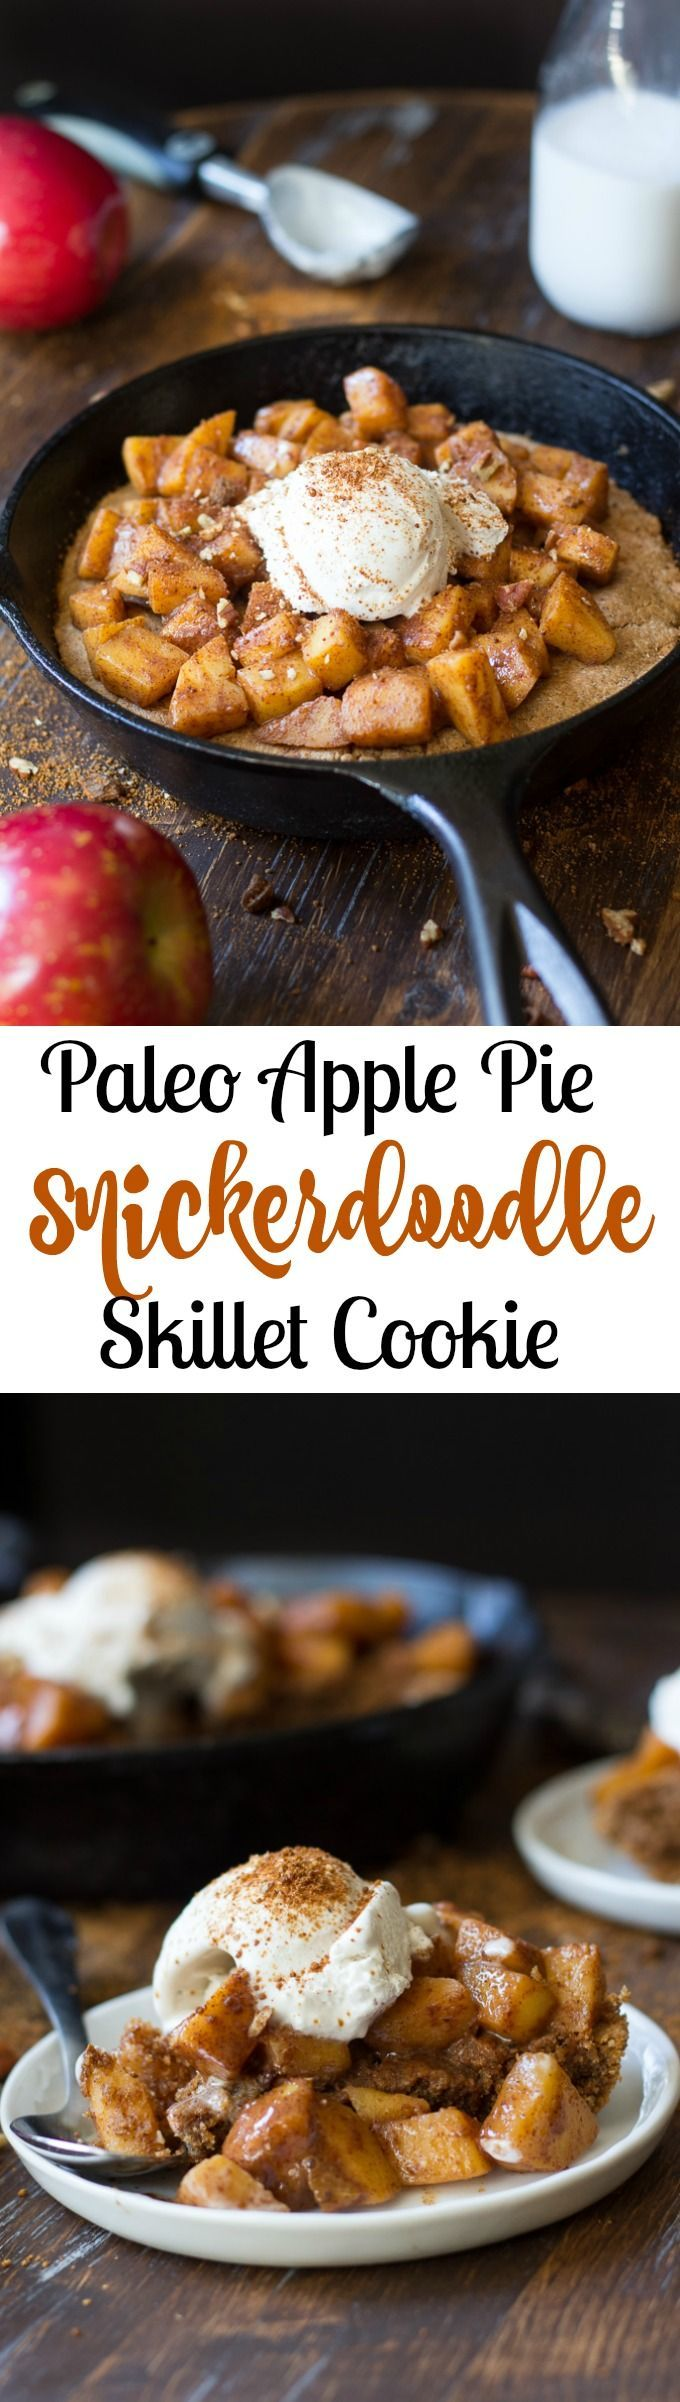 paleo apple pie snickerdoodle skillet cookie - chewy paleo snickerdoodle skillet cookie topped with healthy, refined sugar free apple pie filling!  Amazing Paleo dessert!